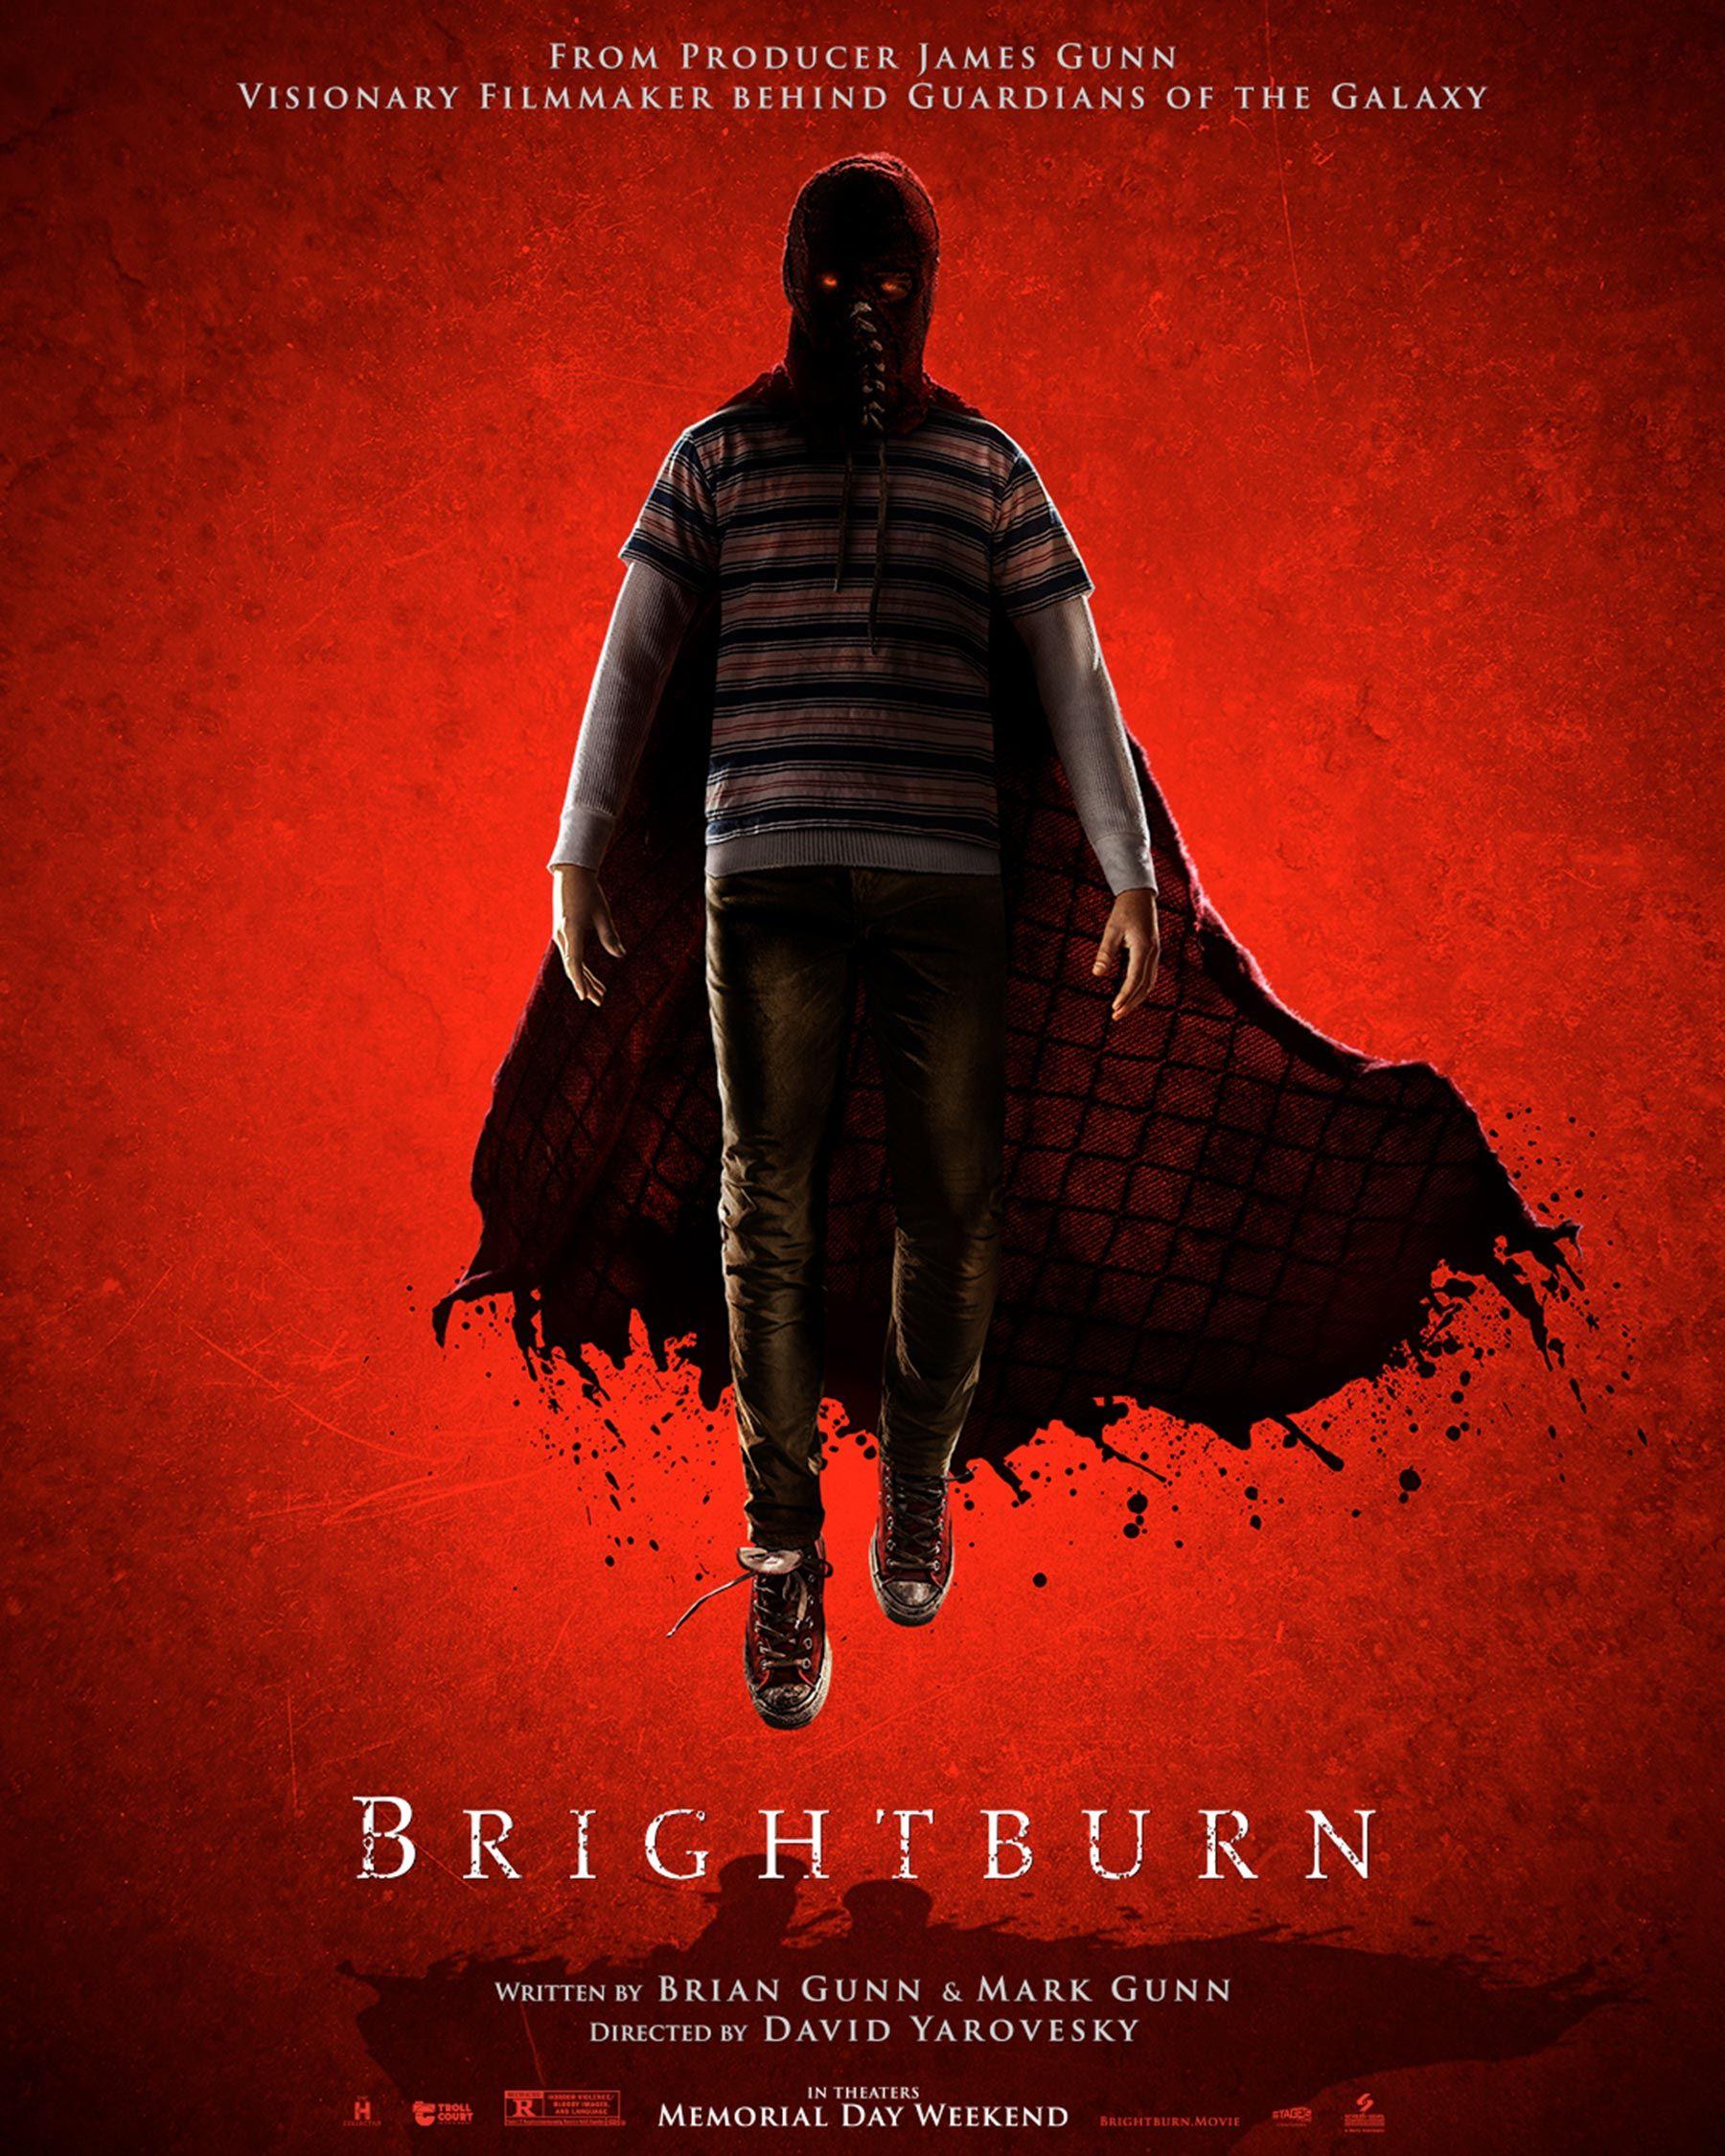 Download reported: Brightburn: Brightburn 2019 720p HDCAM-1XBET